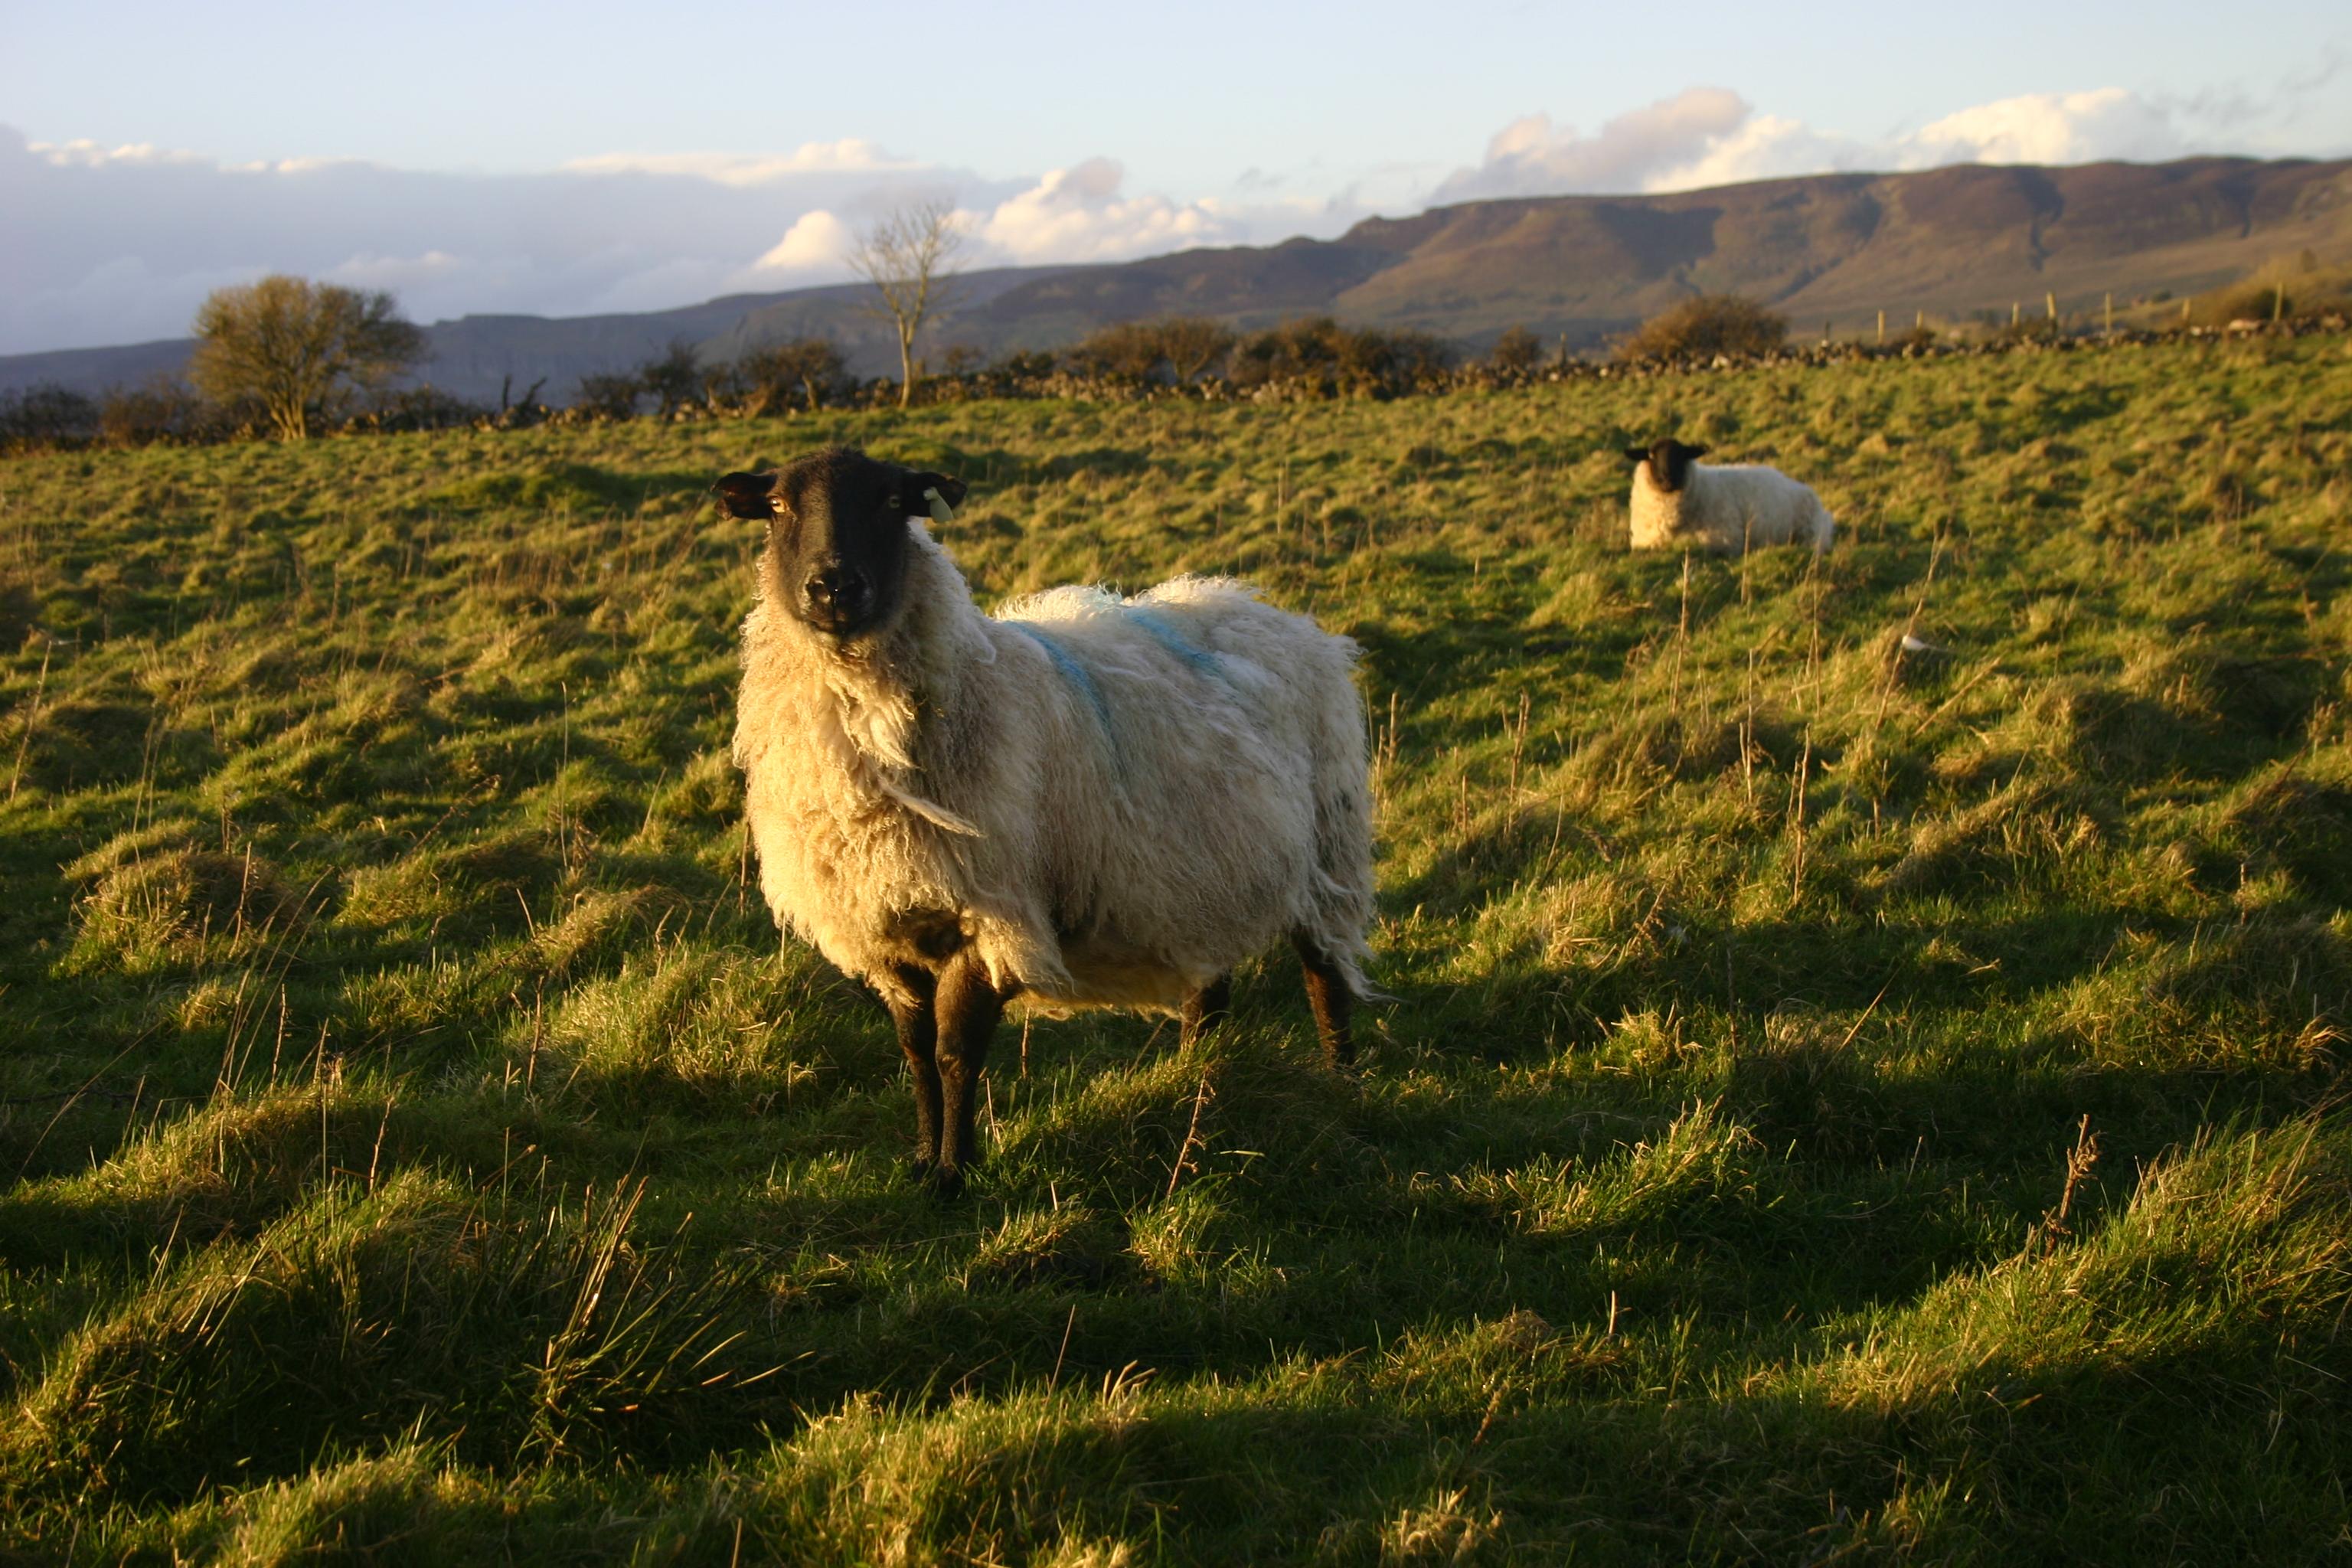 Wallpaper Landscape Animals Grass Field Green Wildlife Farm Ireland Sheep February 2017 Animal Grassland Outdoor Countryside Pasture